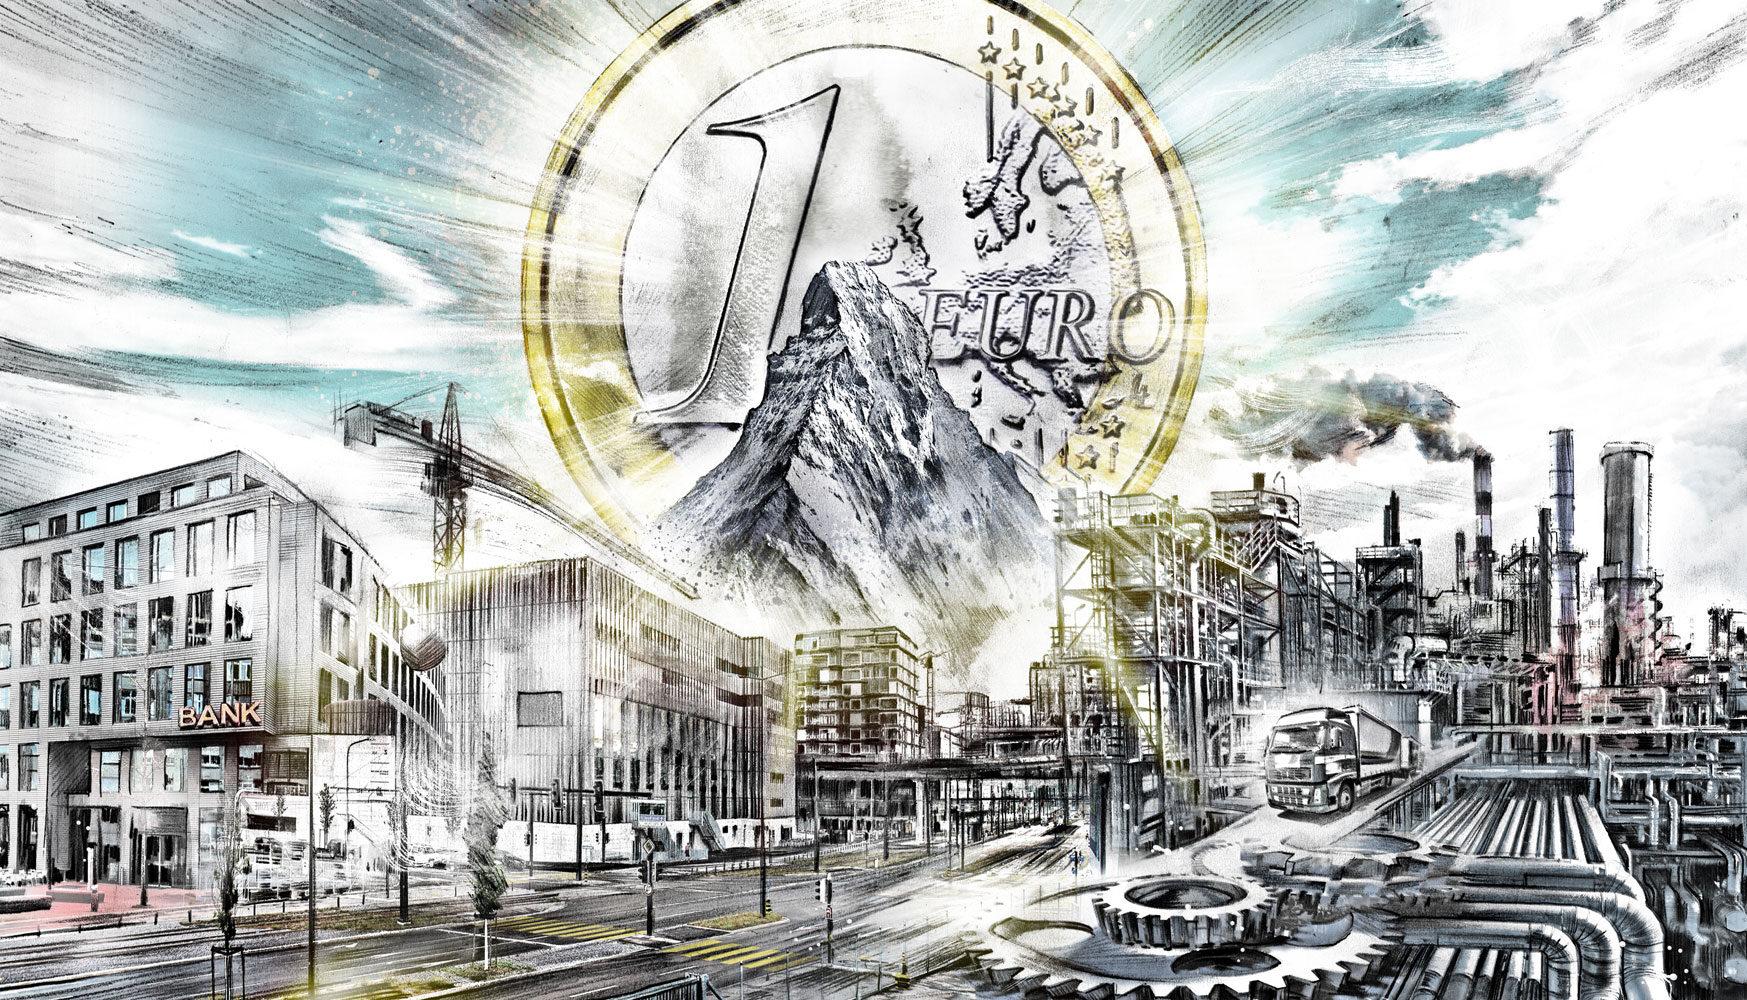 Wirtschaftsprognose 2018 - Kornel Illustration | Kornel Stadler portfolio